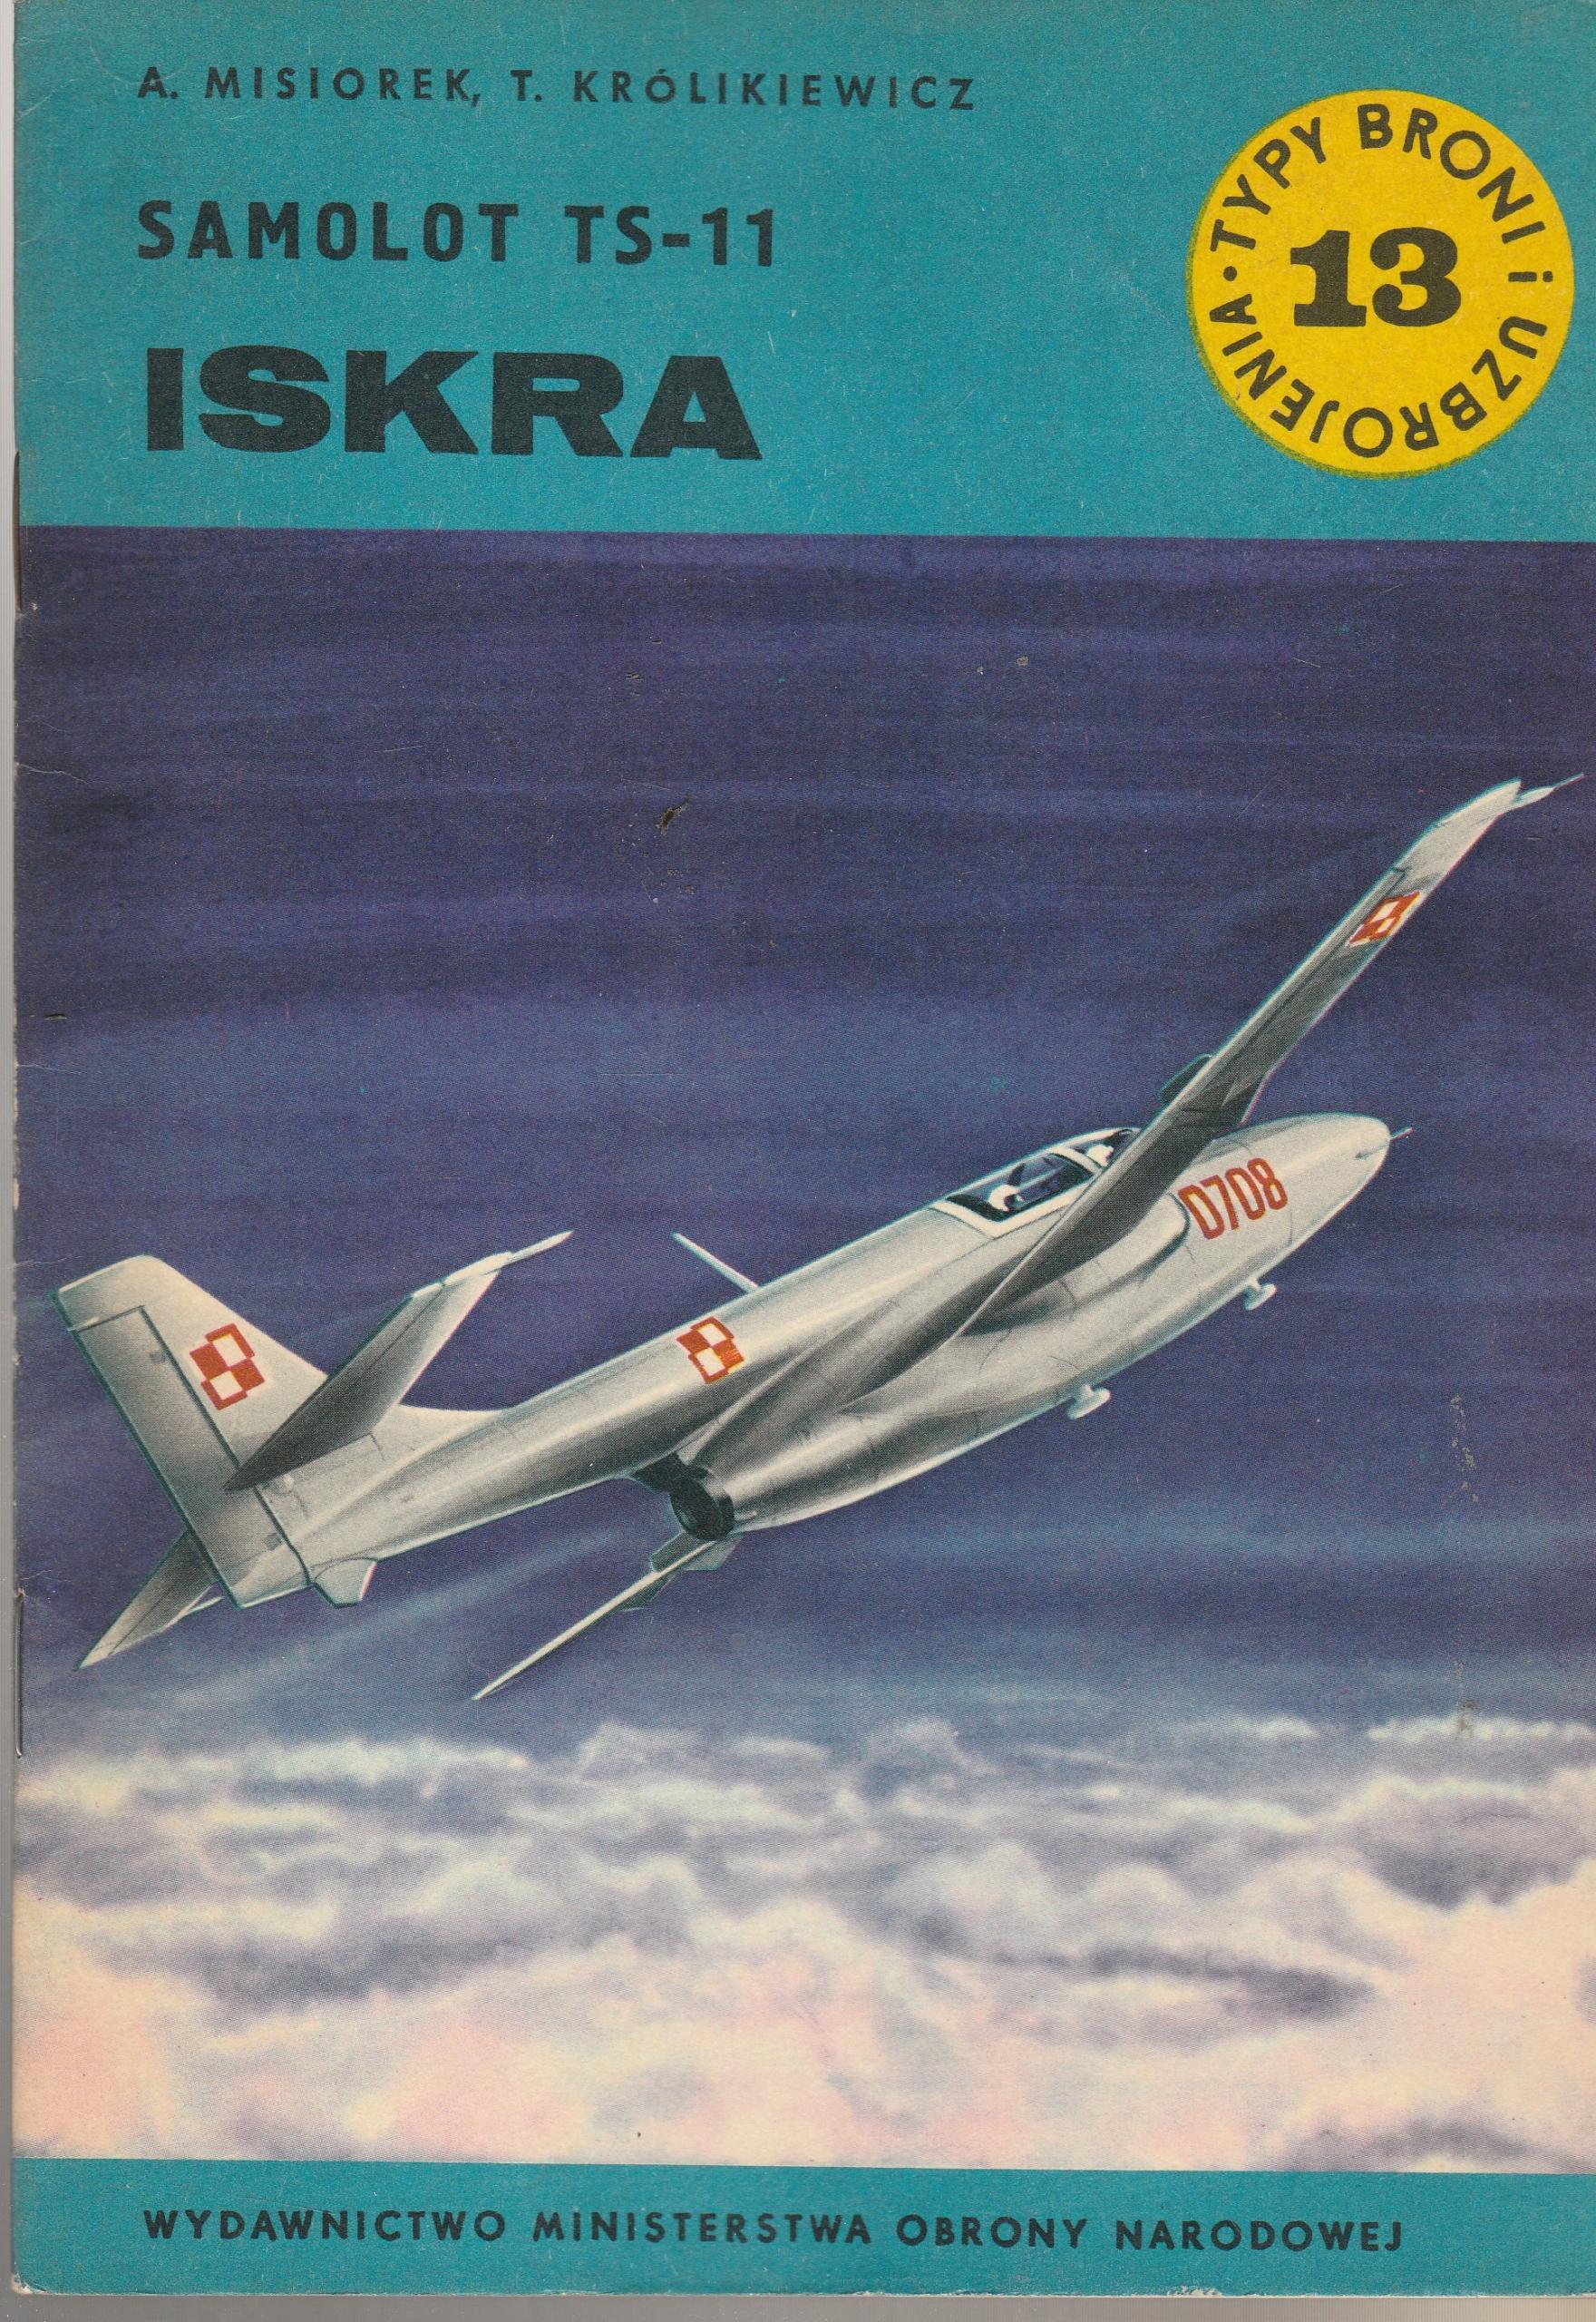 TBiU nr 13 Samolot TS-11 Iskra